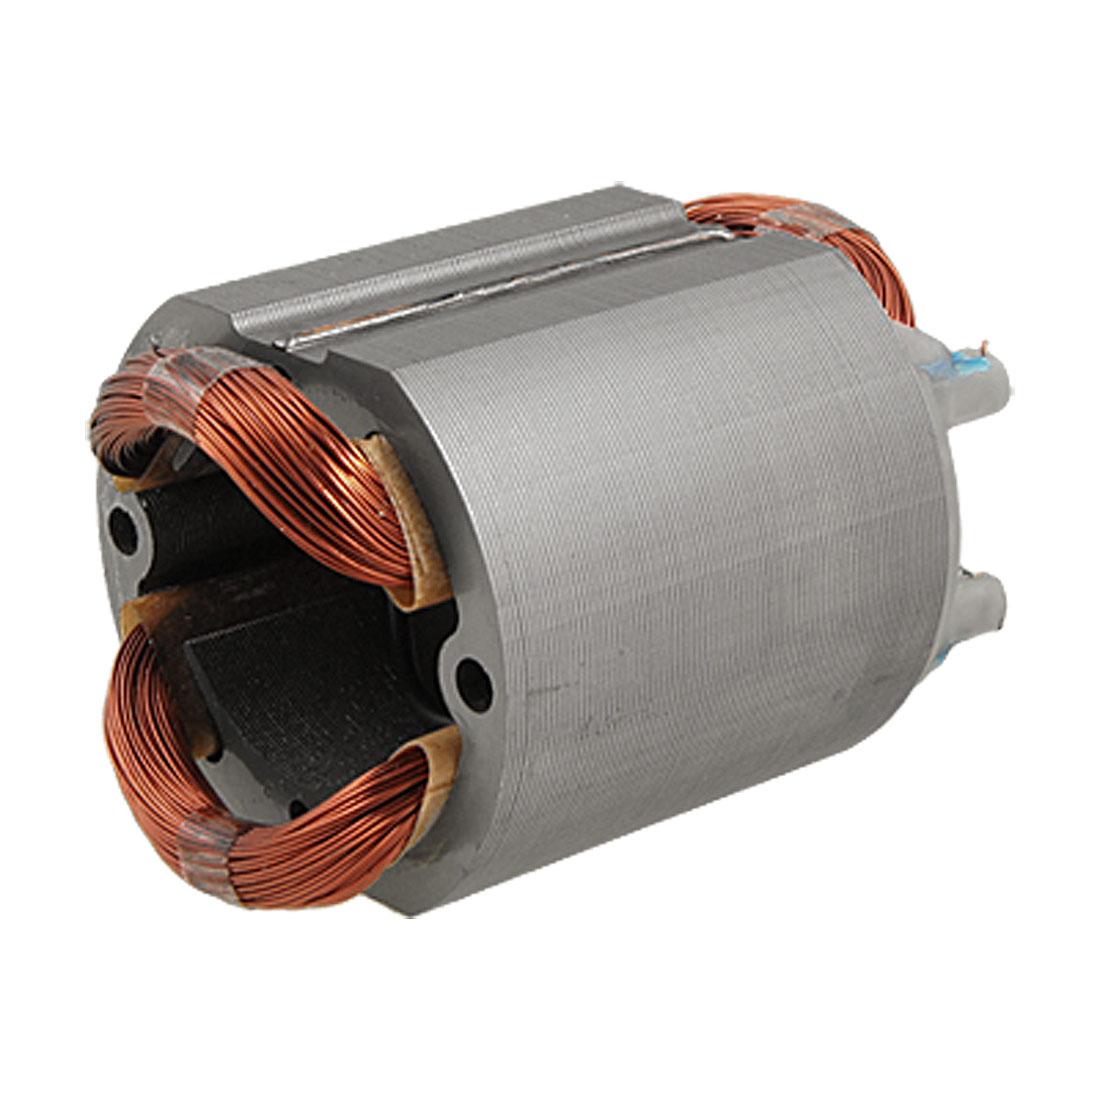 AC 220V Electric Tool Angle Grinder Stator for Hitachi 100 G10SF3